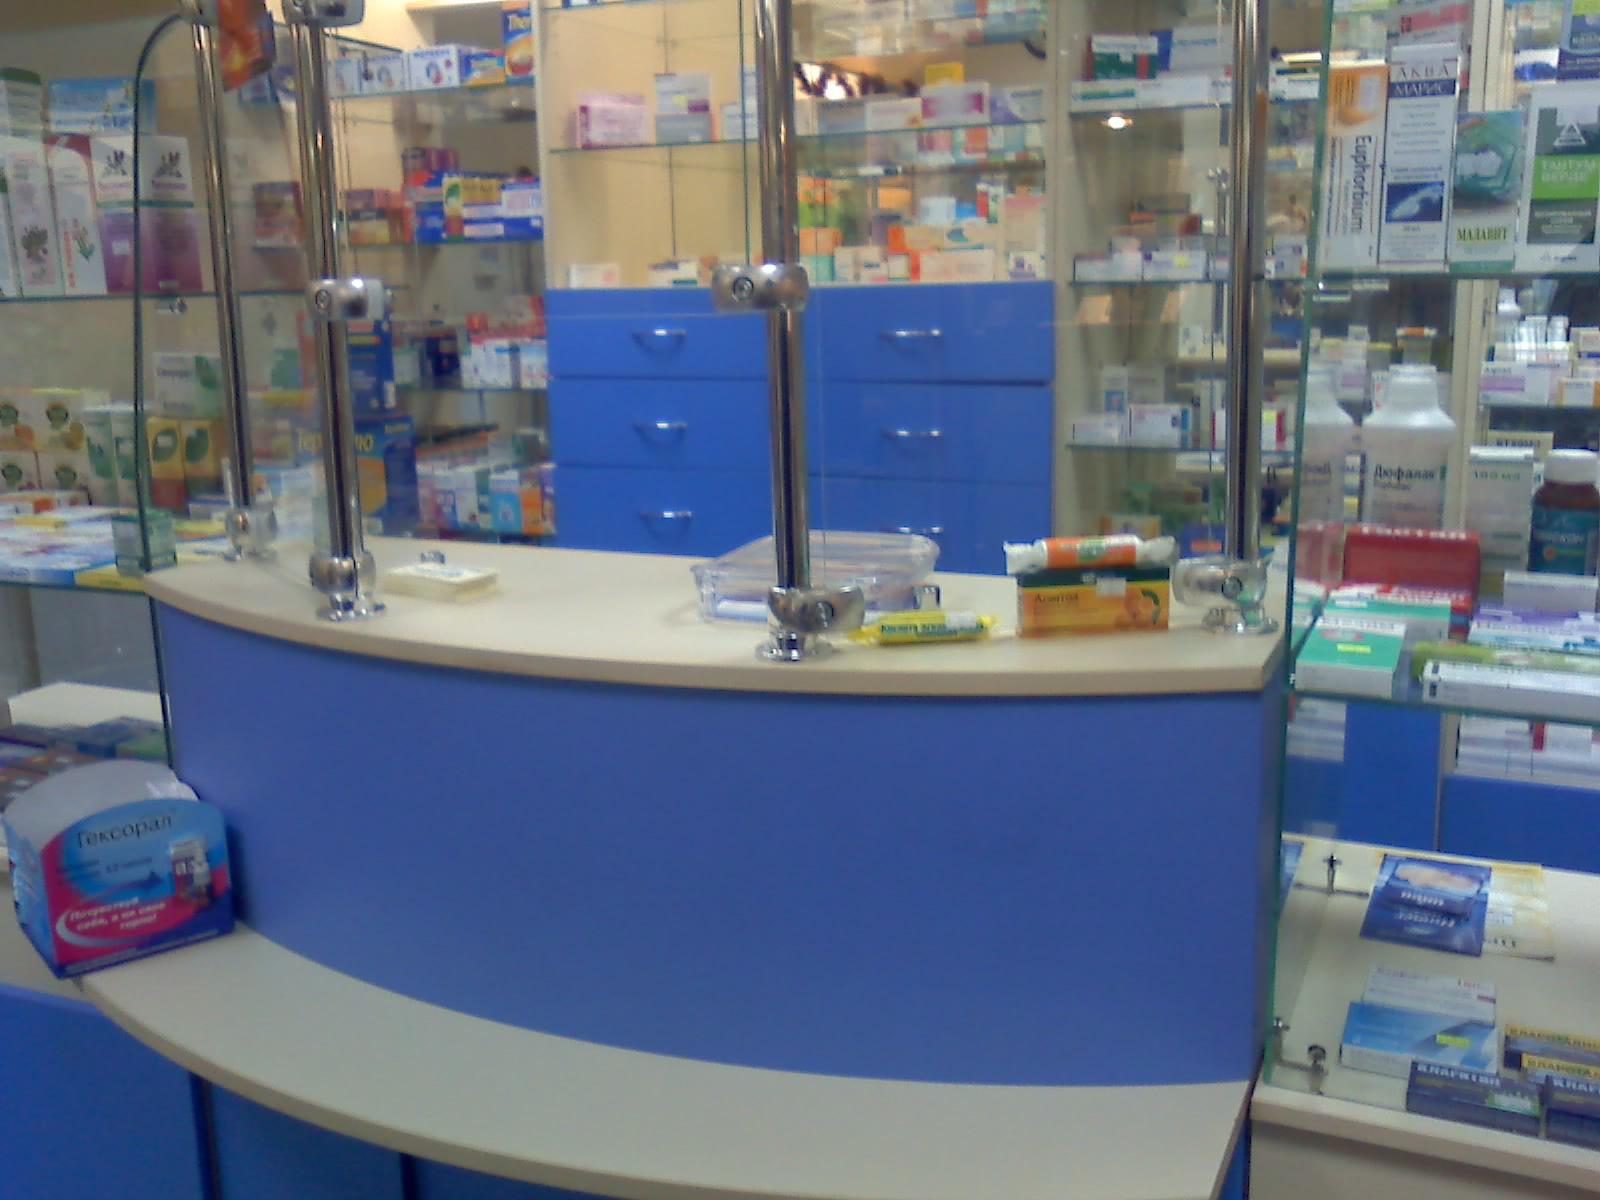 Priligy online pharmacy